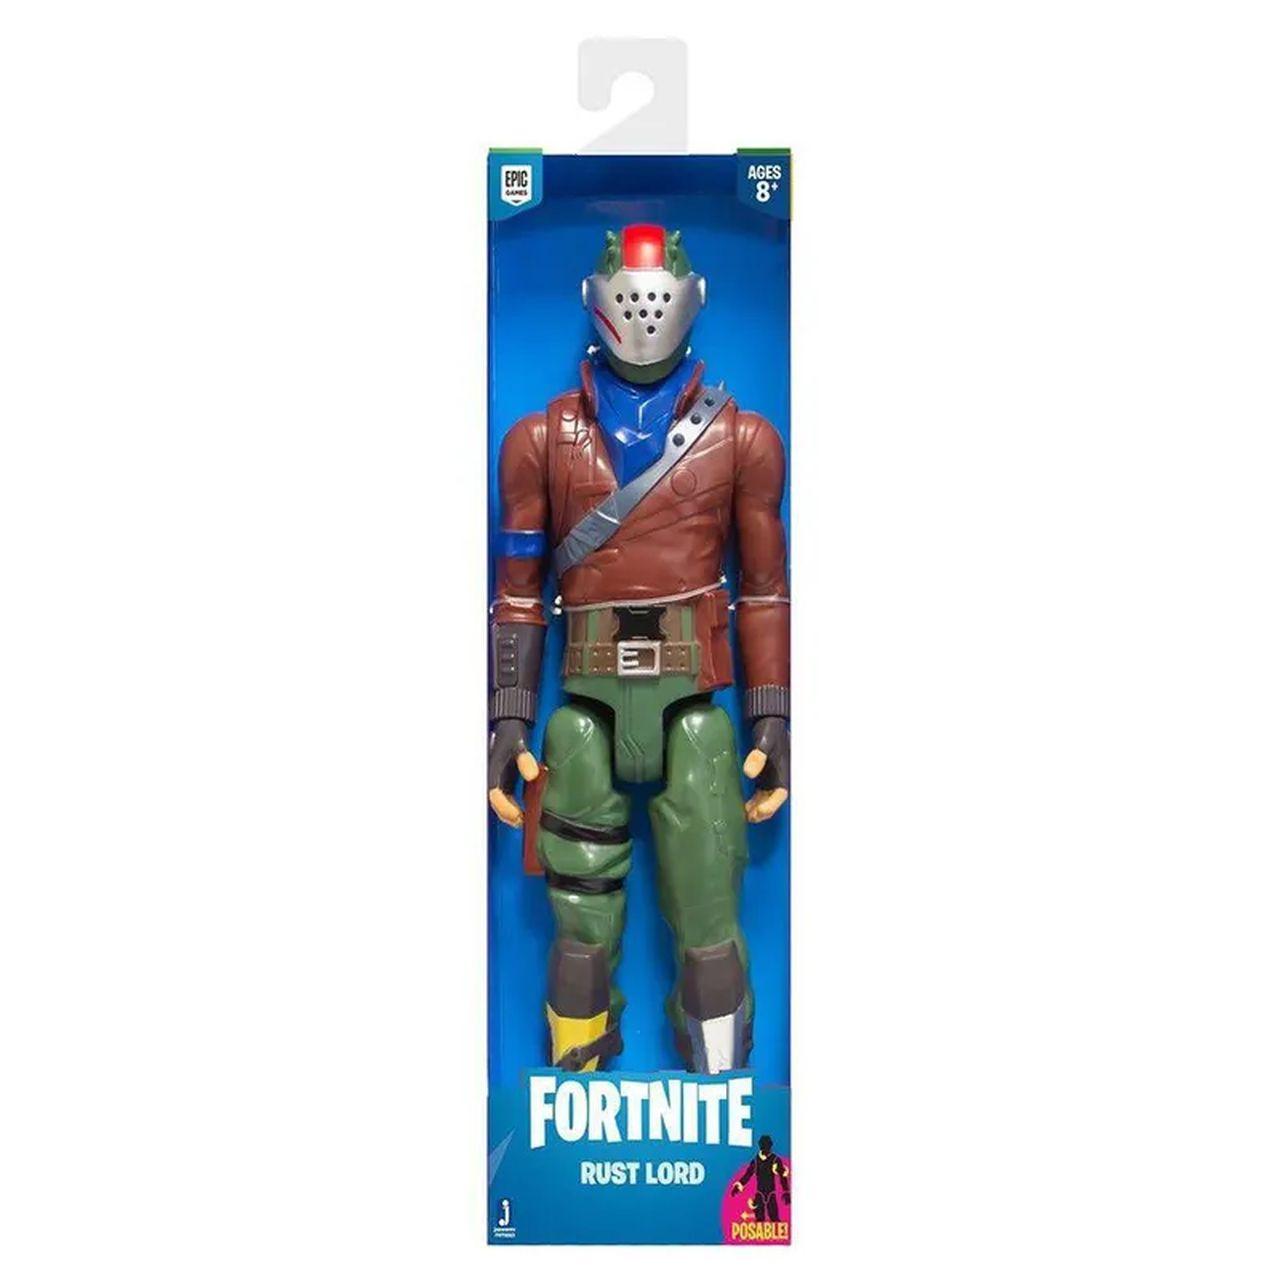 Novo Fortnite - Figura Boneco Rust Lord - 30 cm - Original